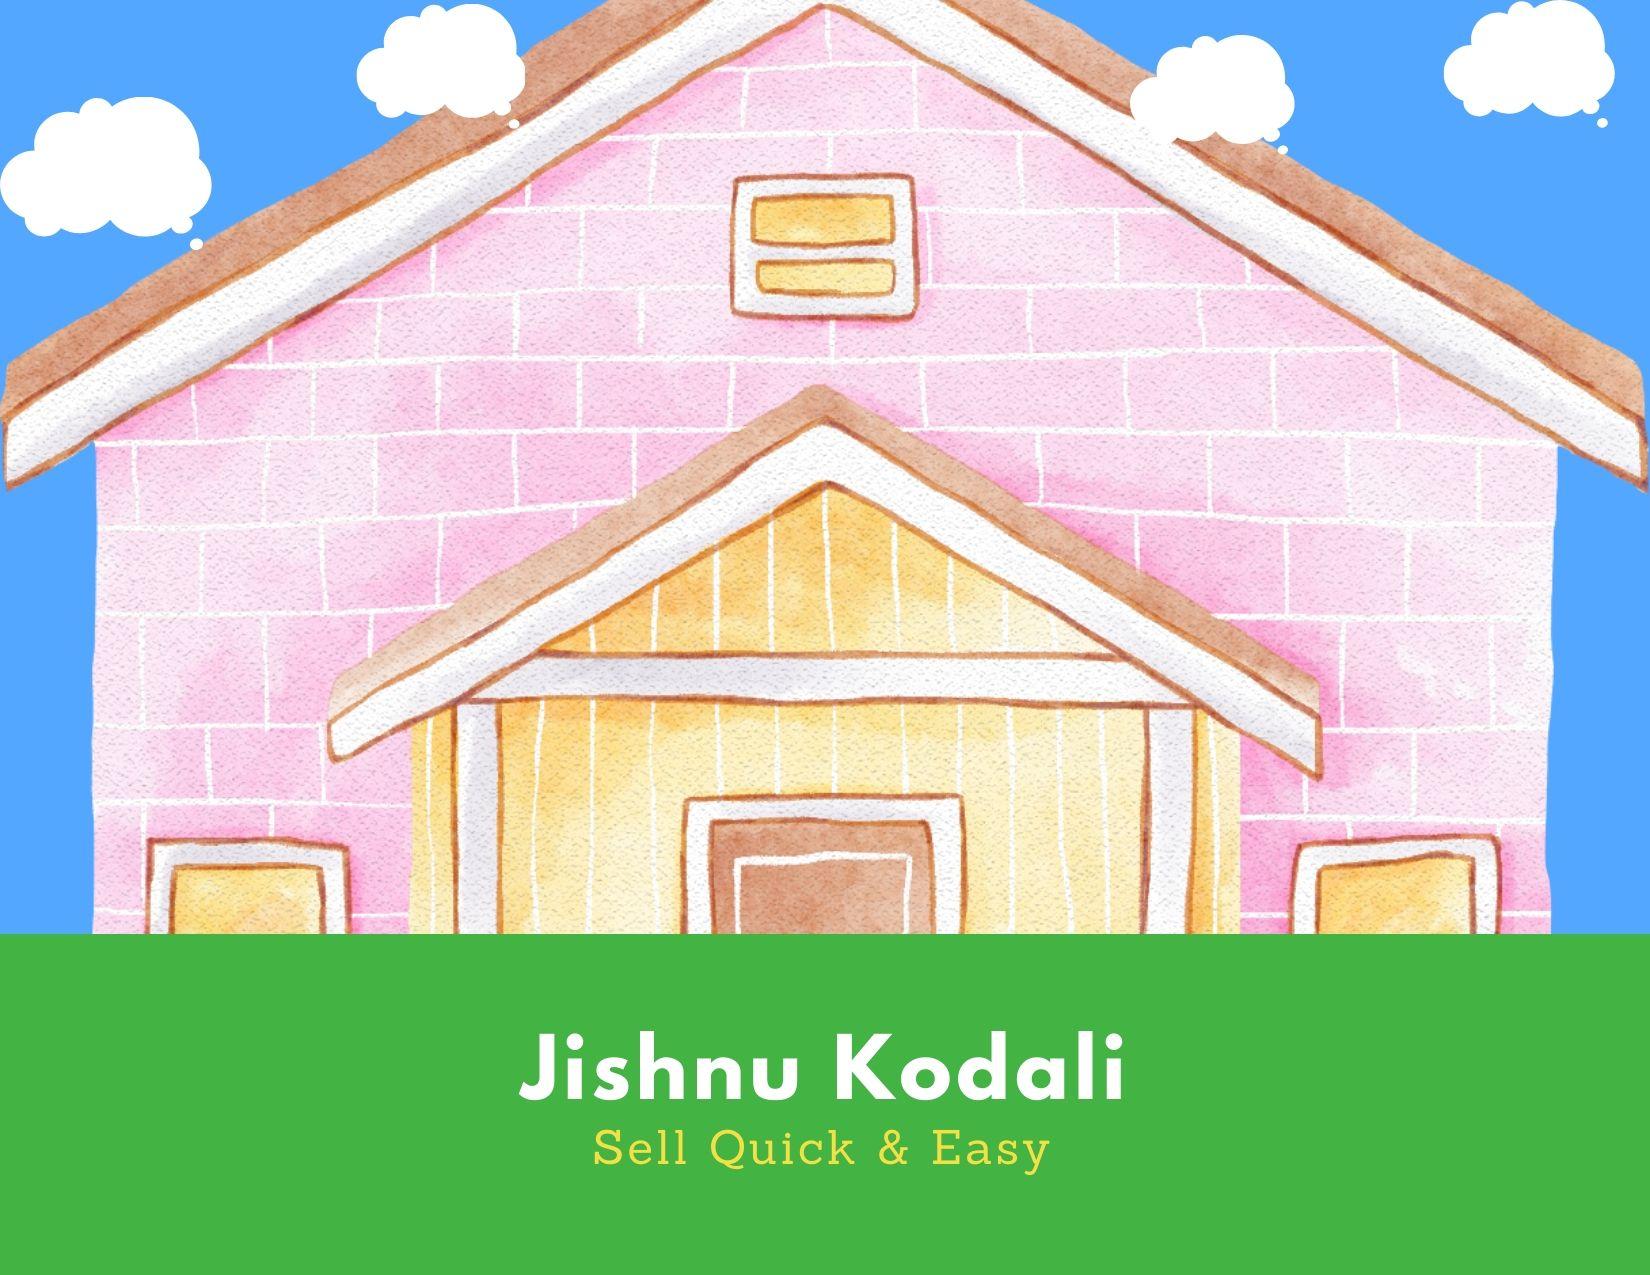 Jishnu Kodali UBS- Your Real Estate Advisor